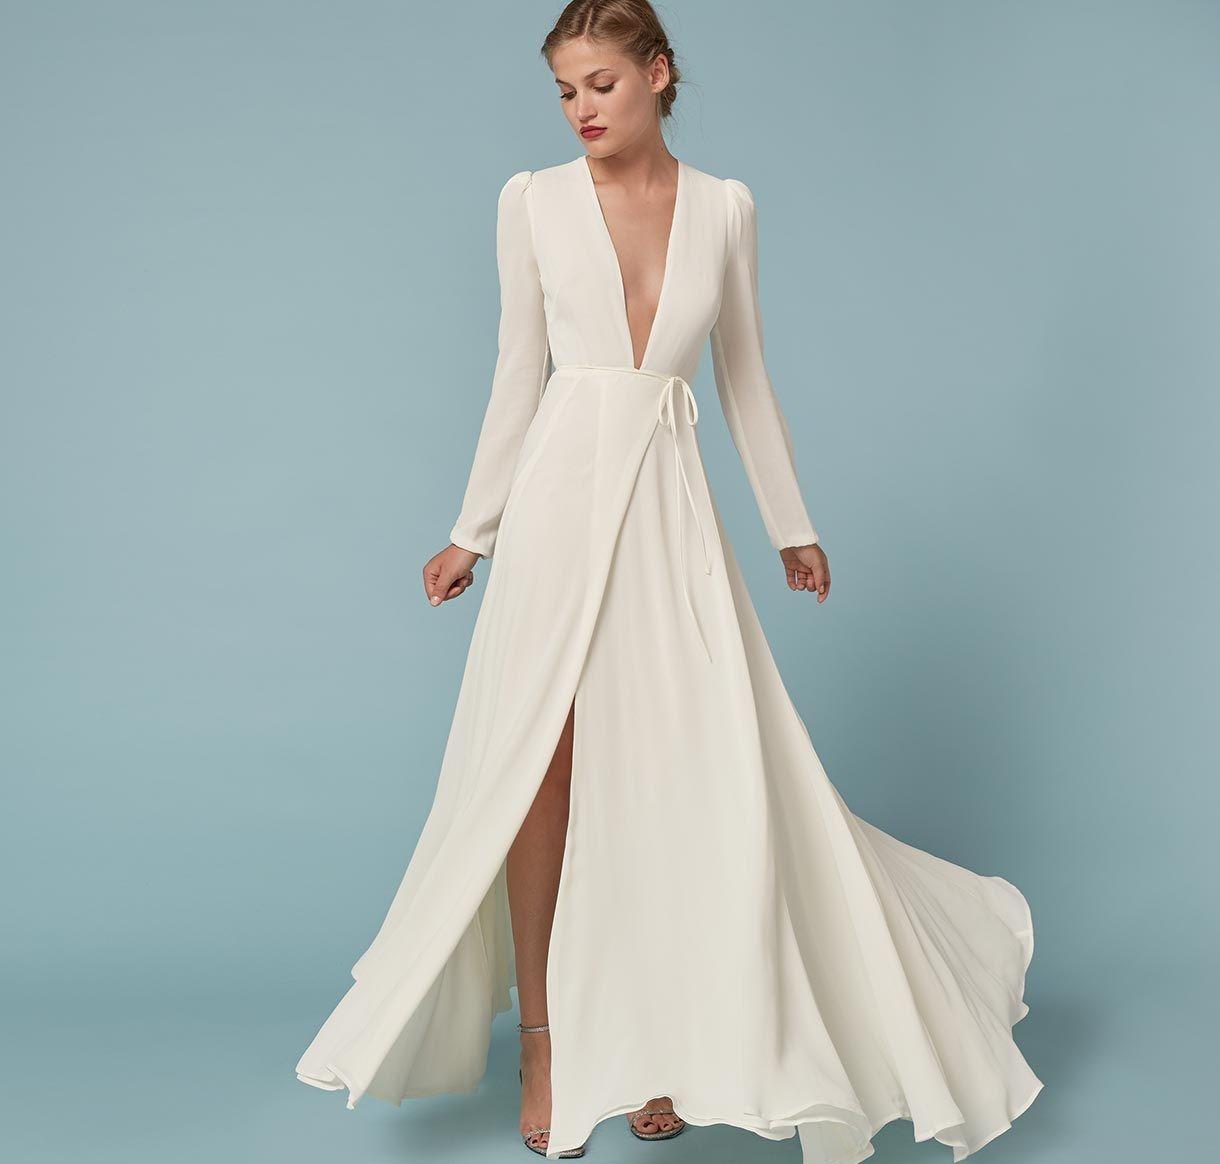 Reformation Thea Dress | 2018 wedding | Pinterest | Reformation ...